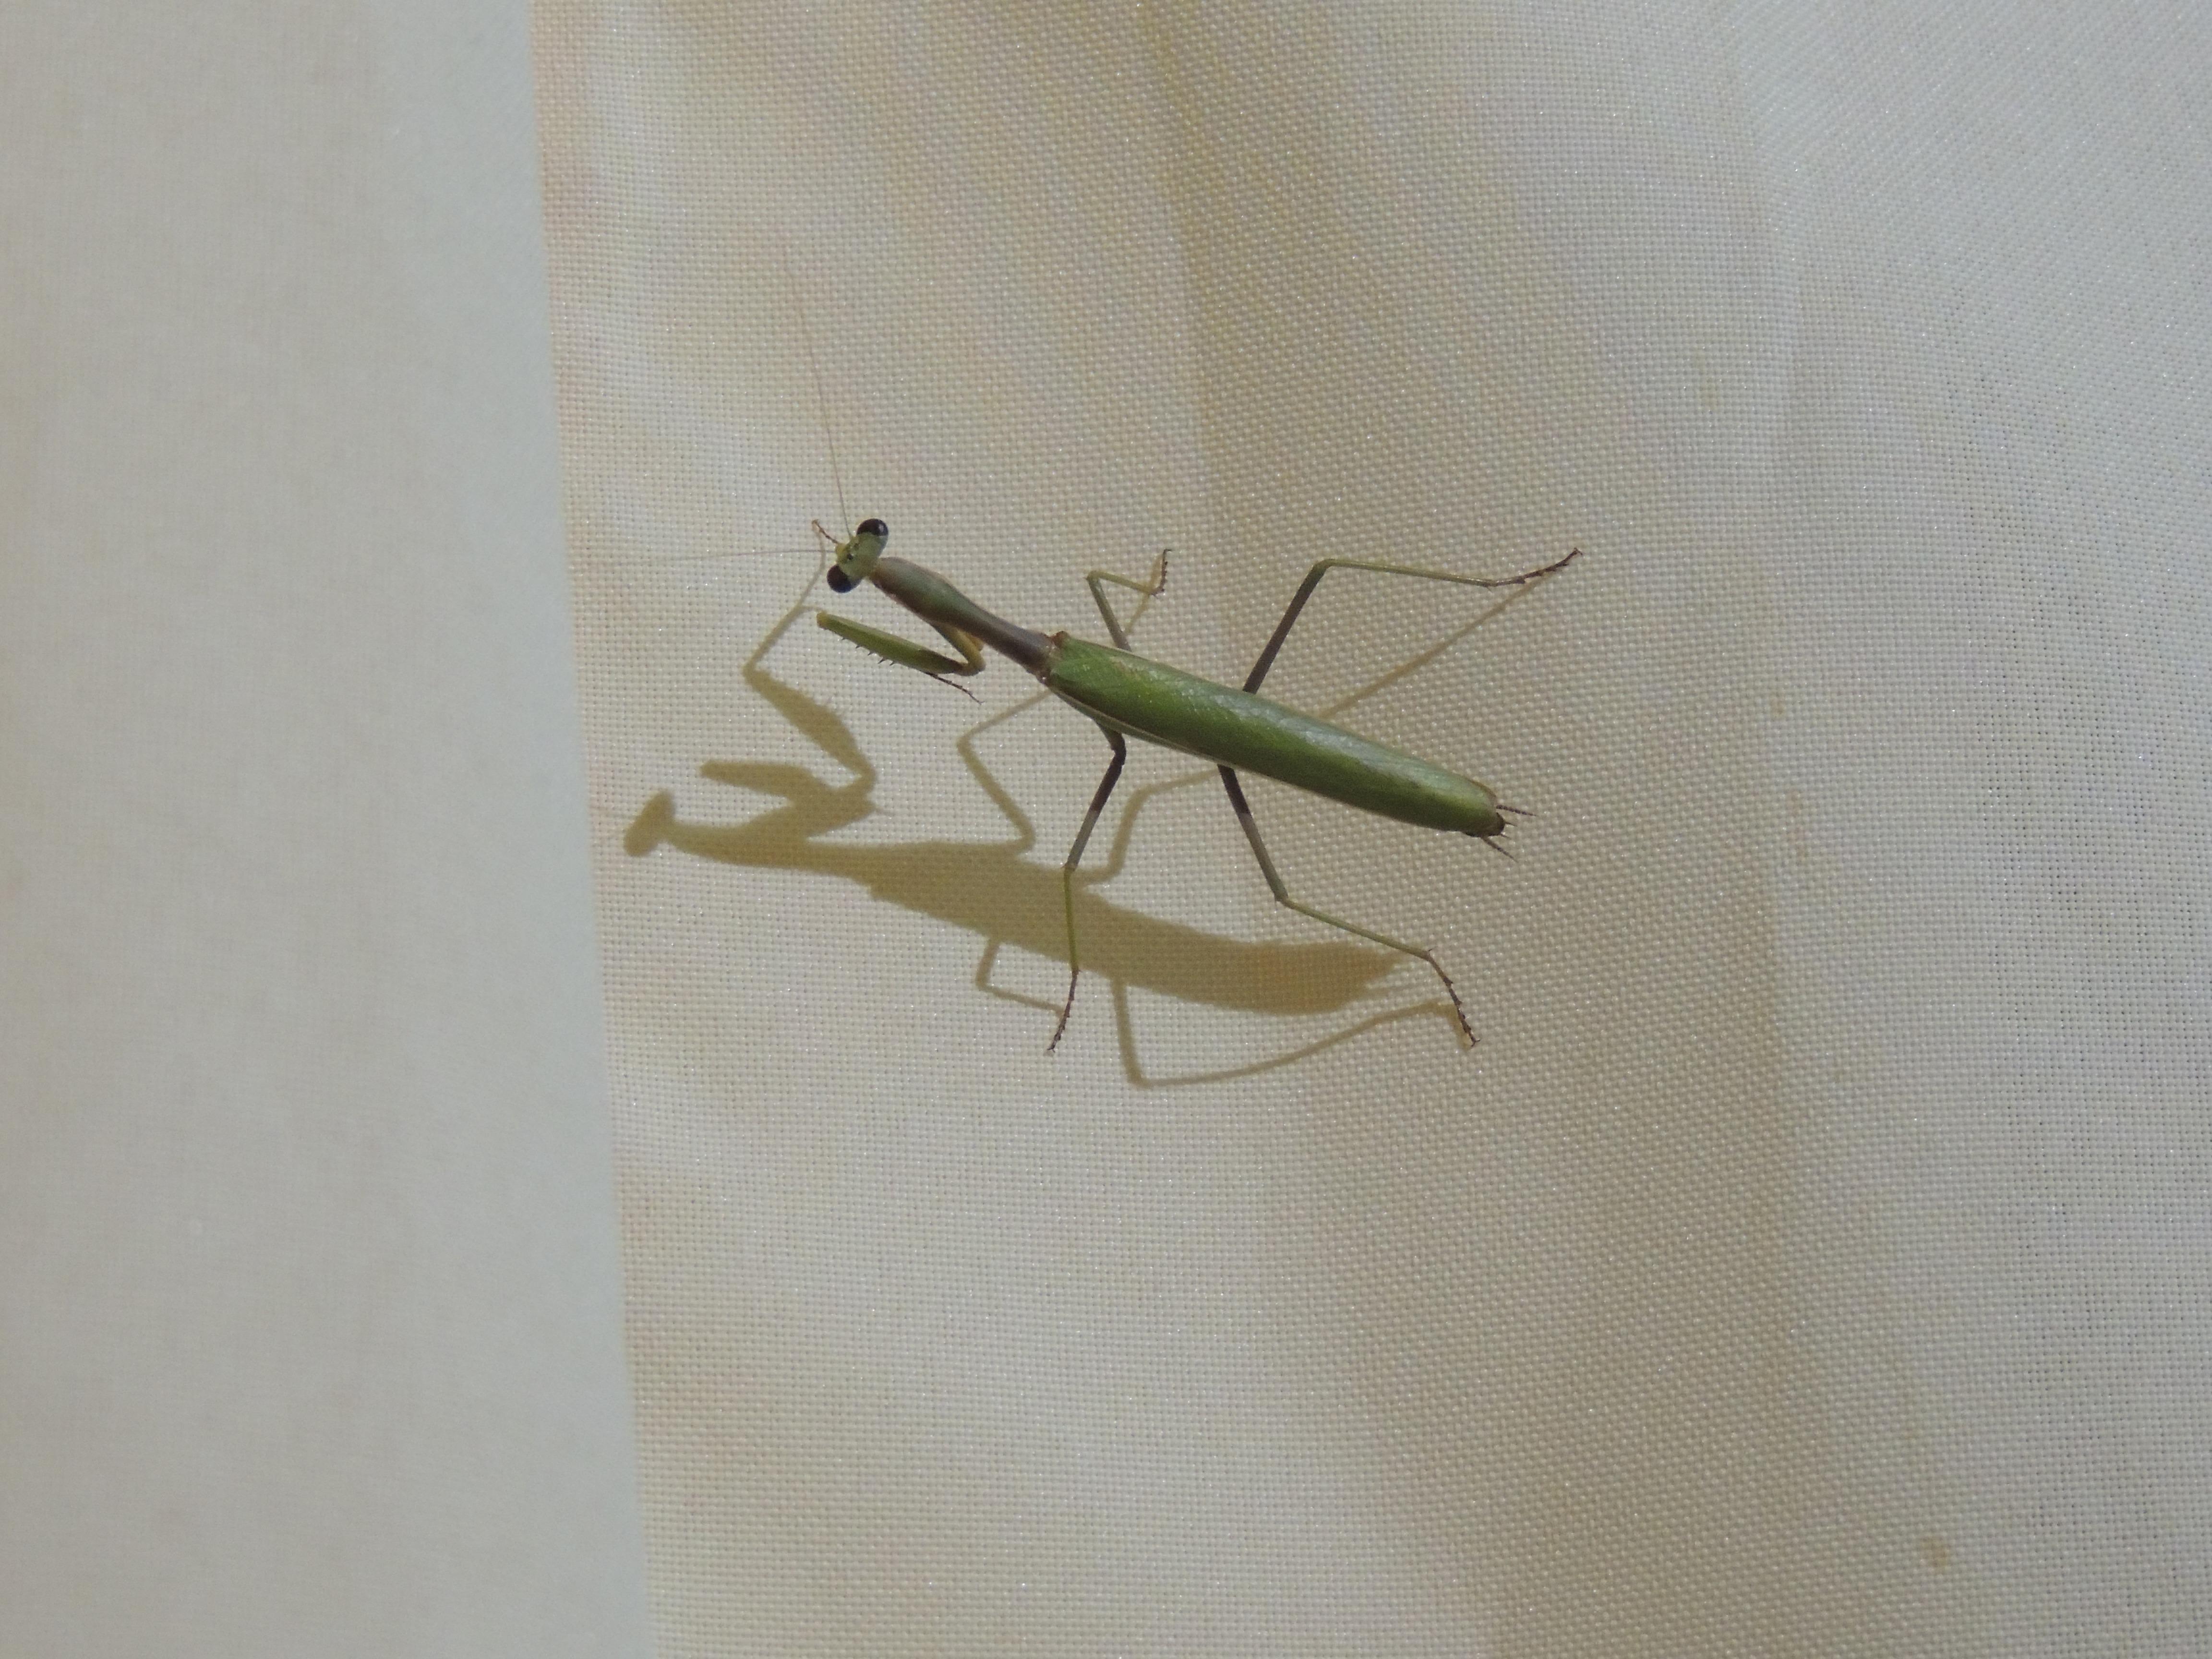 Gambar Alam Sayap Serangga Makro Invertebrata Seni